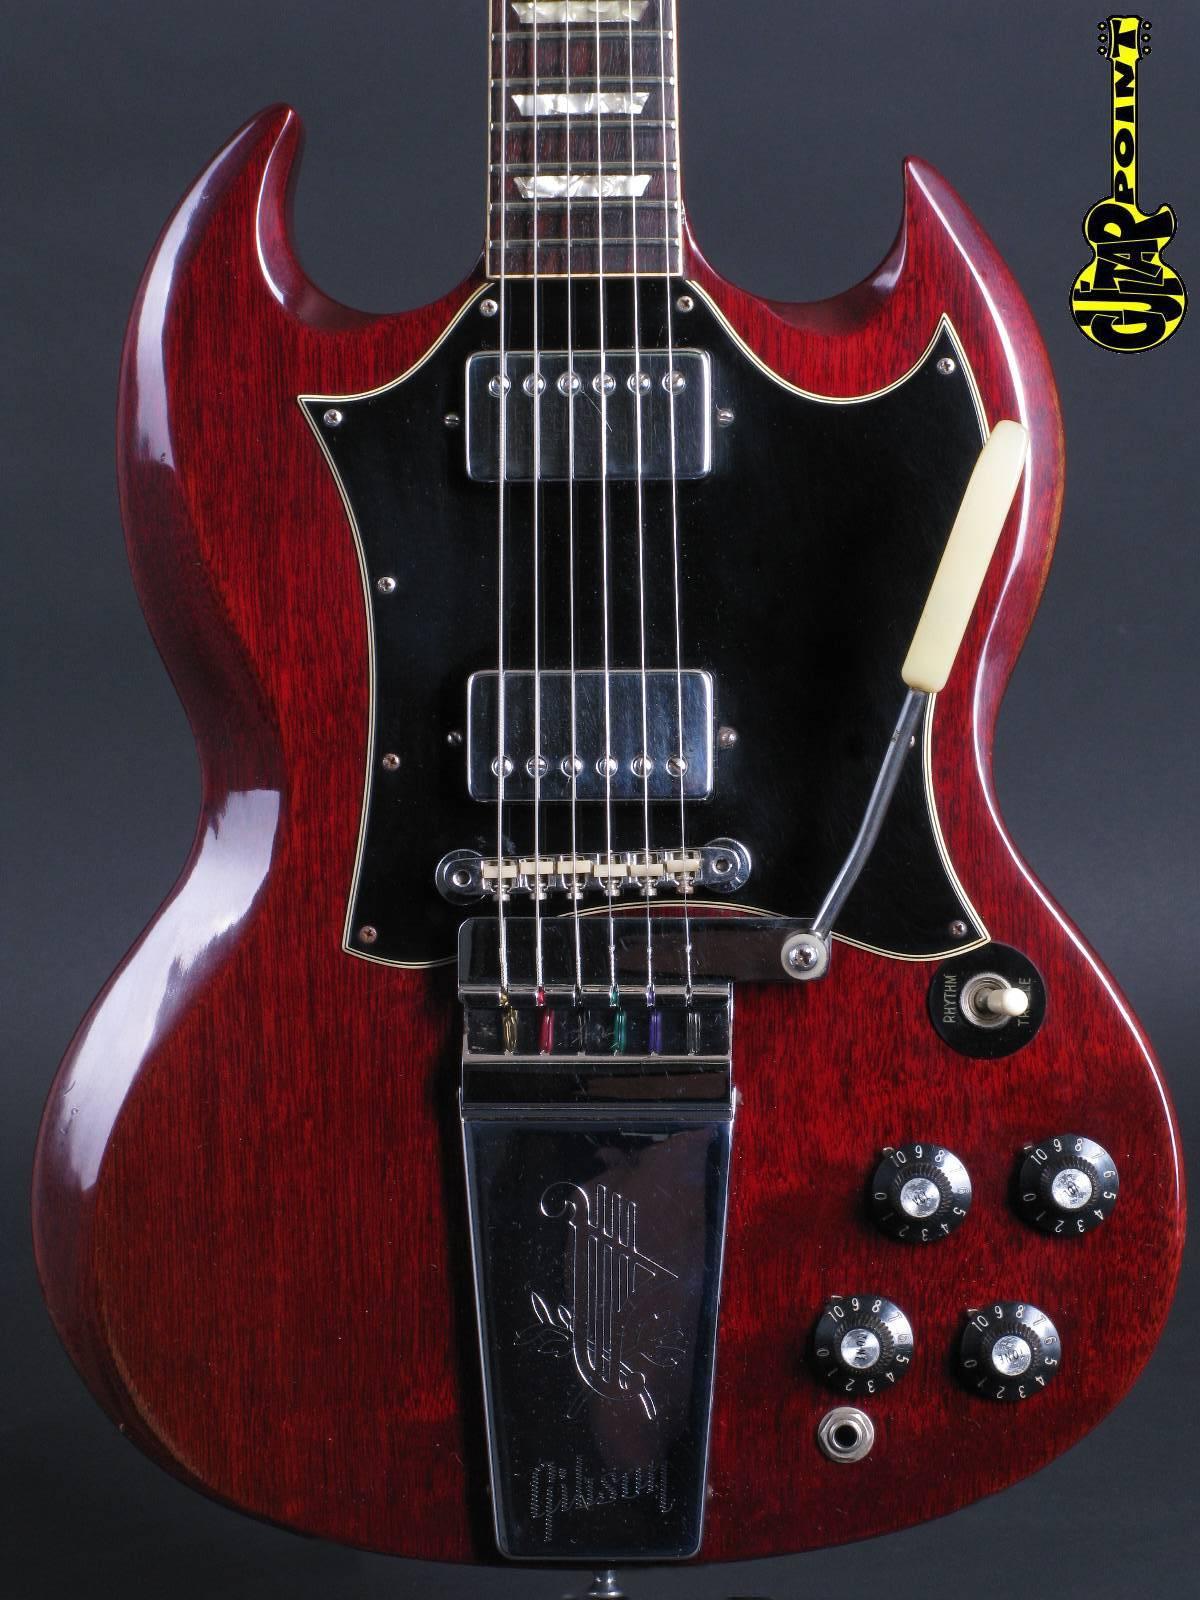 1969 Gibson SG Standard - Cherry  (like 1968)